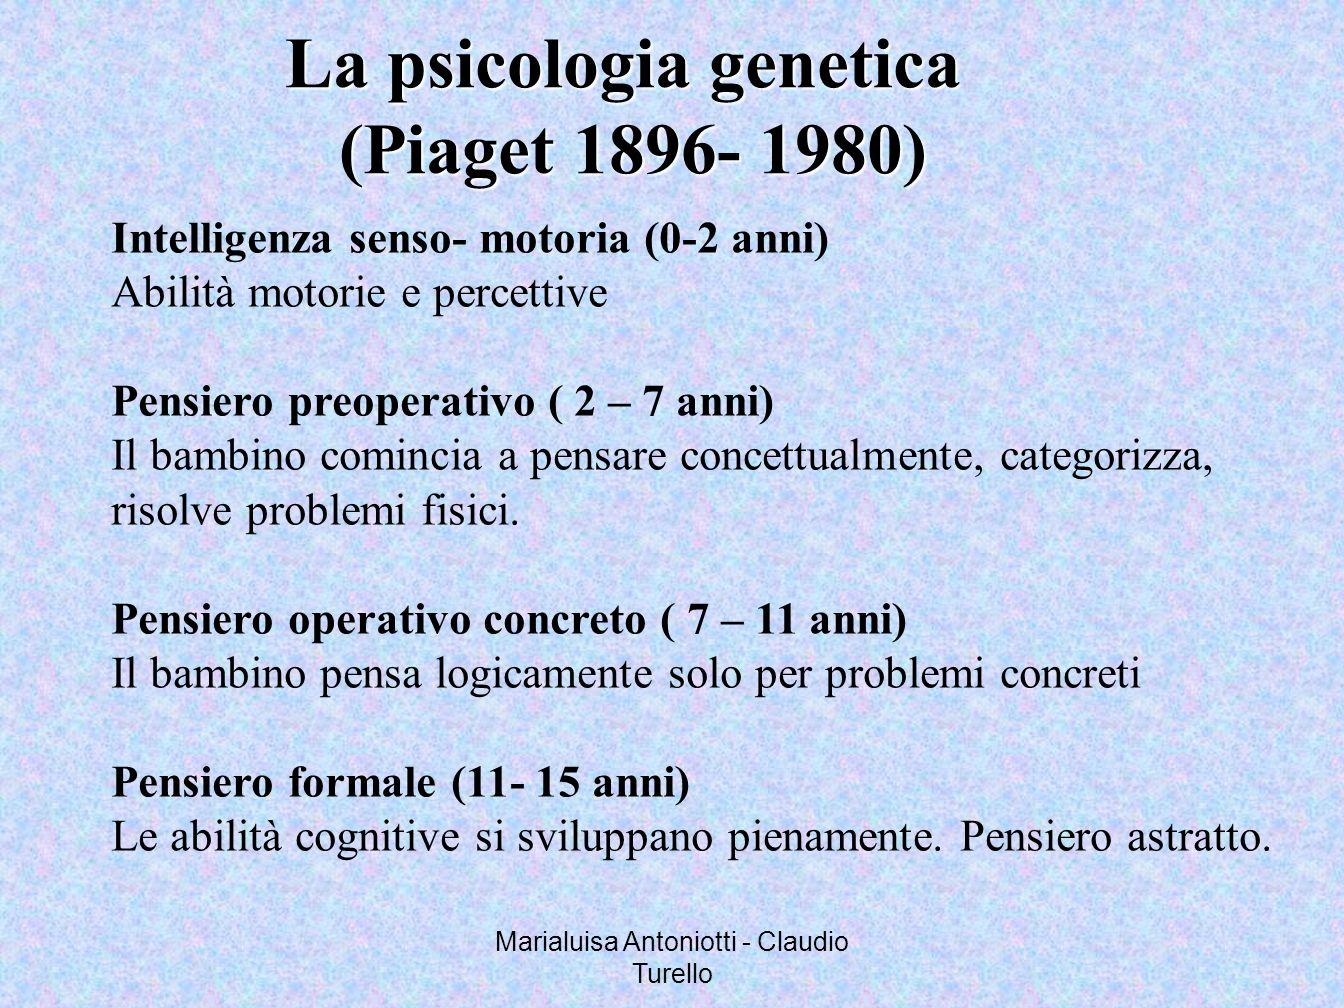 Marialuisa Antoniotti - Claudio Turello La psicologia genetica (Piaget 1896- 1980) (Piaget 1896- 1980) Intelligenza senso- motoria (0-2 anni) Abilità